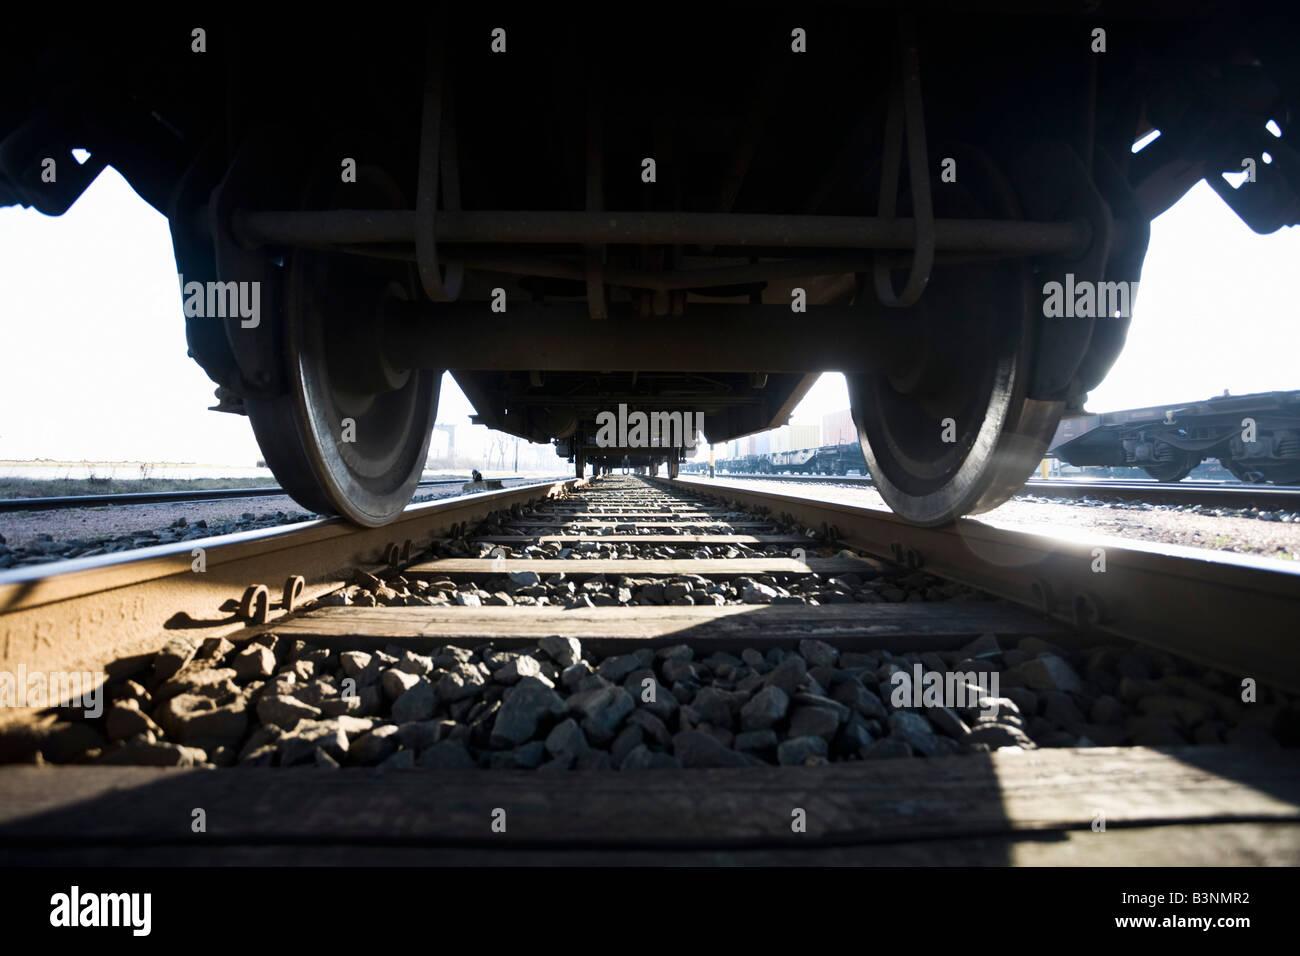 Germany, railway-car - Stock Image